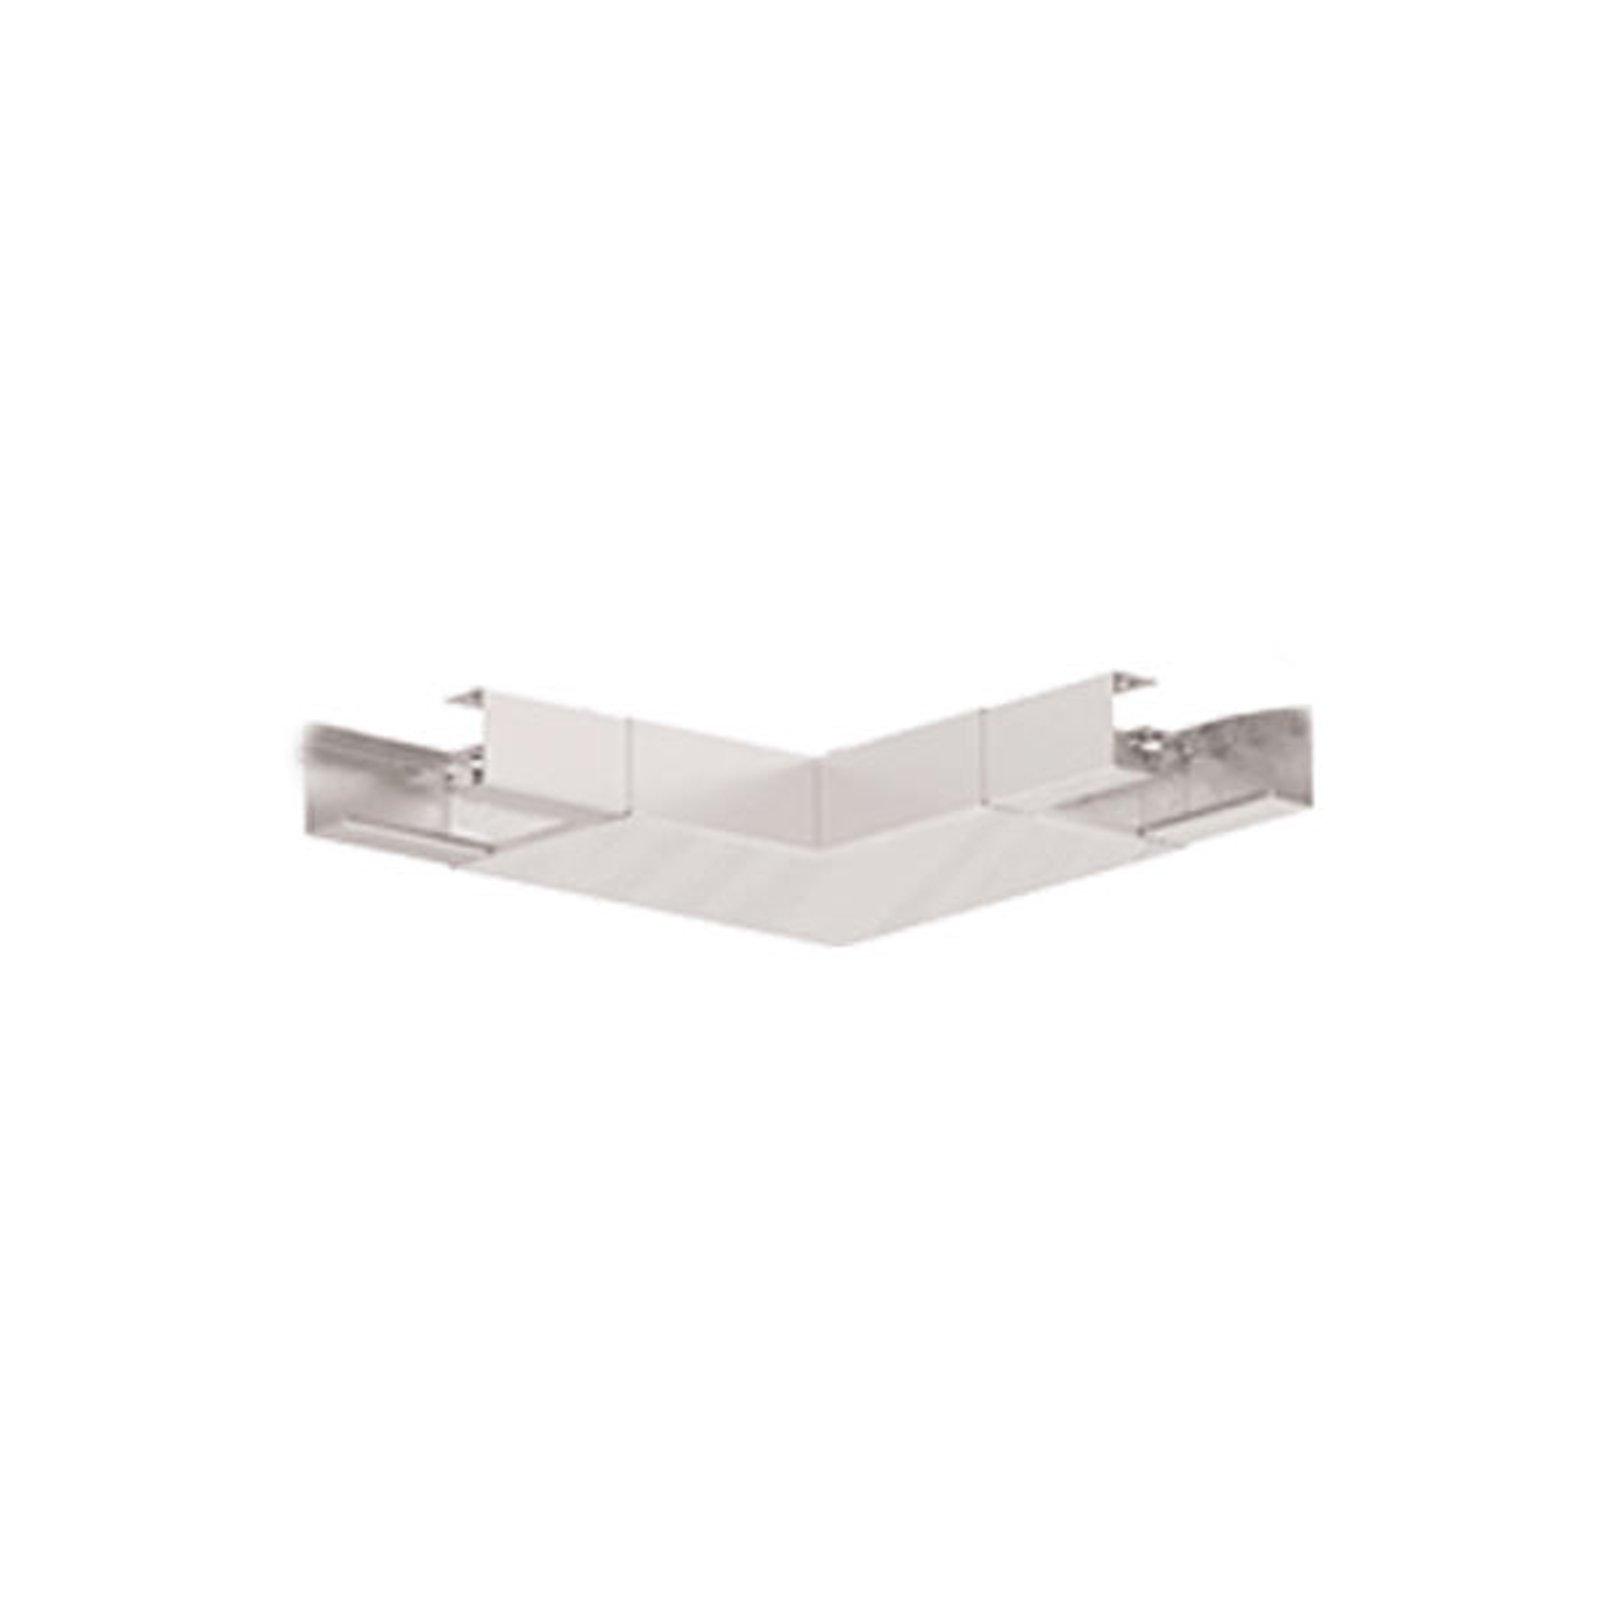 Forbinder Procube-CUVE-1 L90° for DL Procube